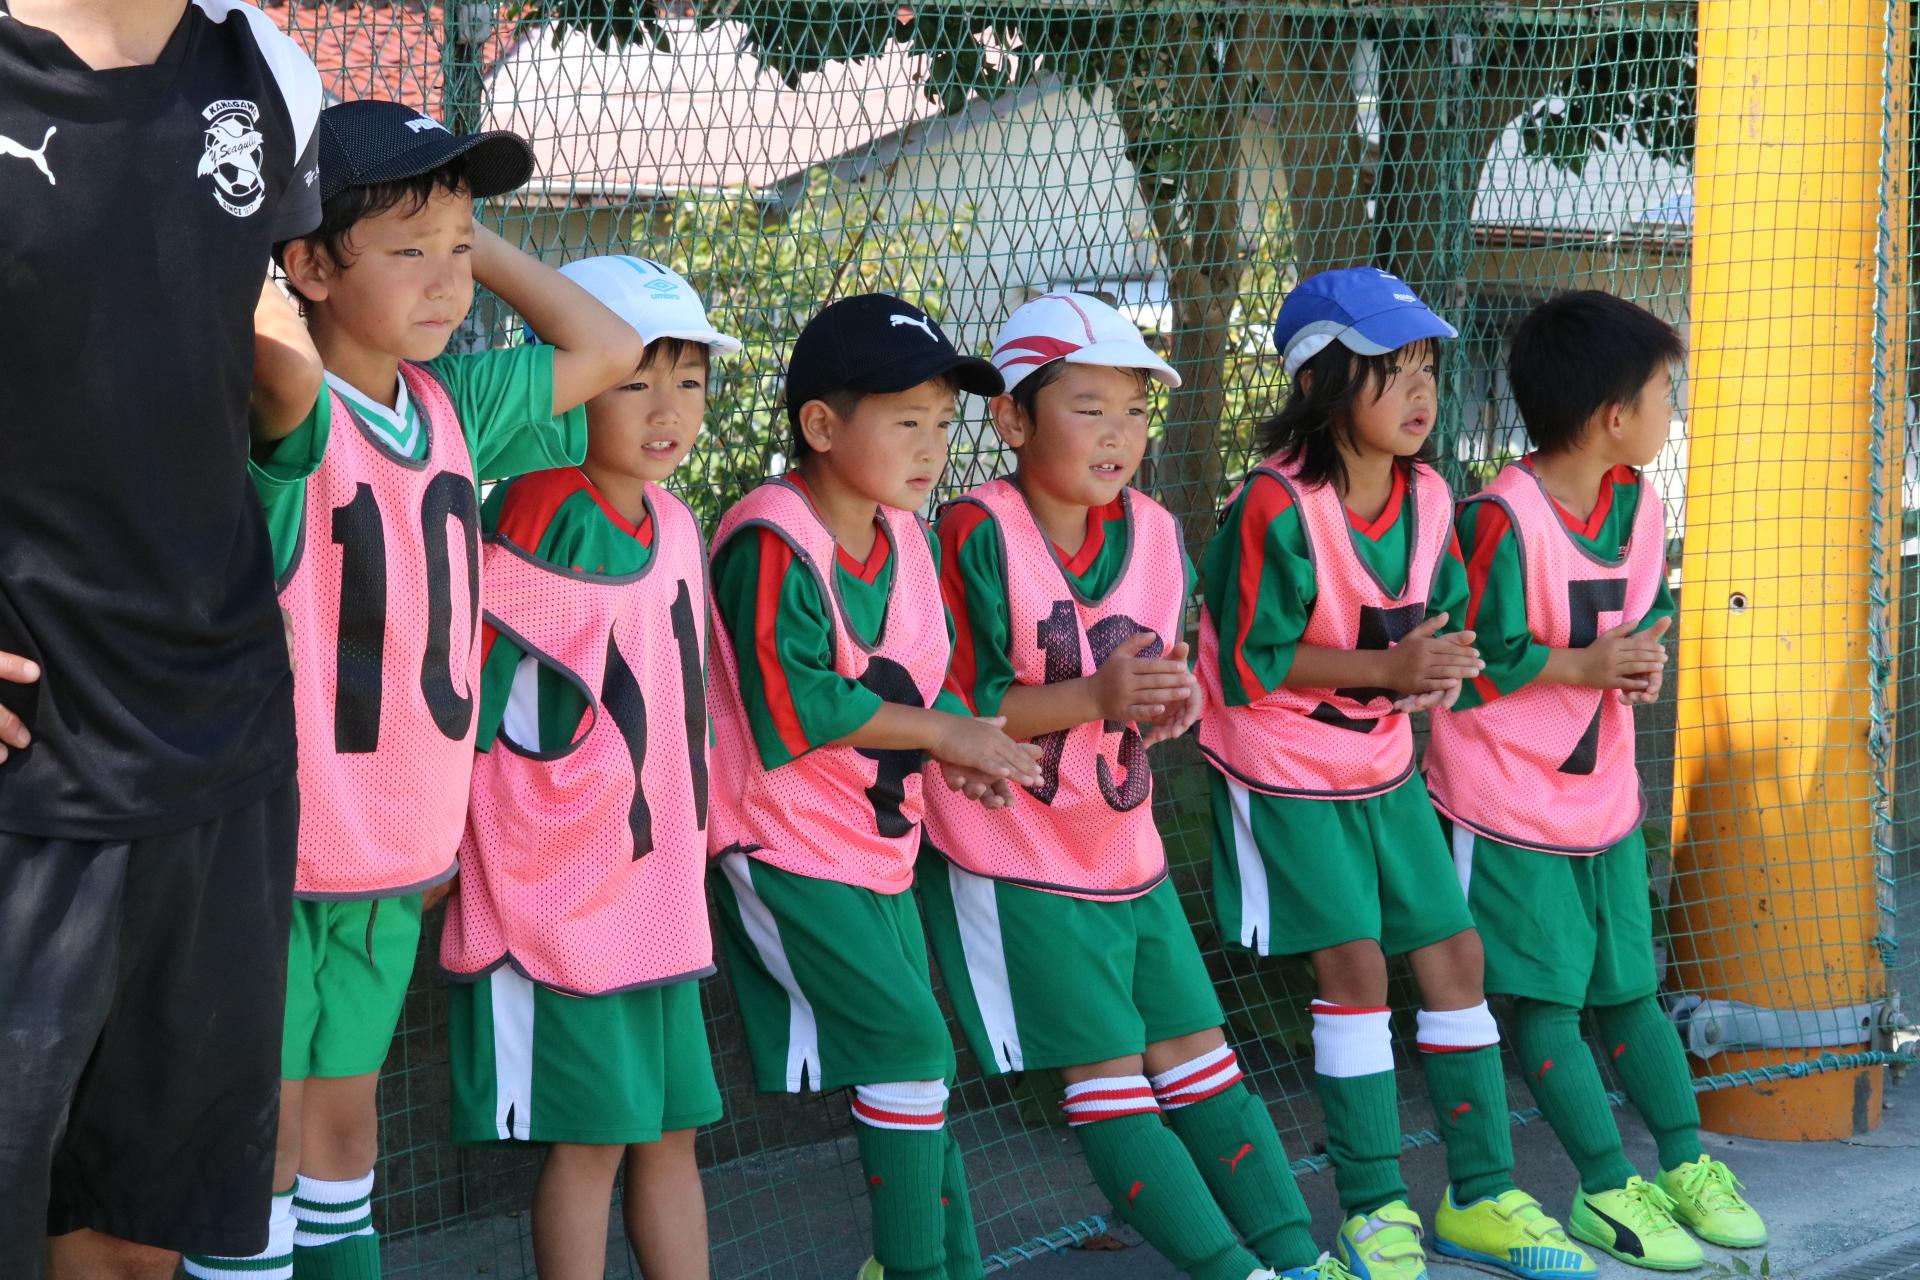 9月10日(日) U-7 低学年夏の特別大会